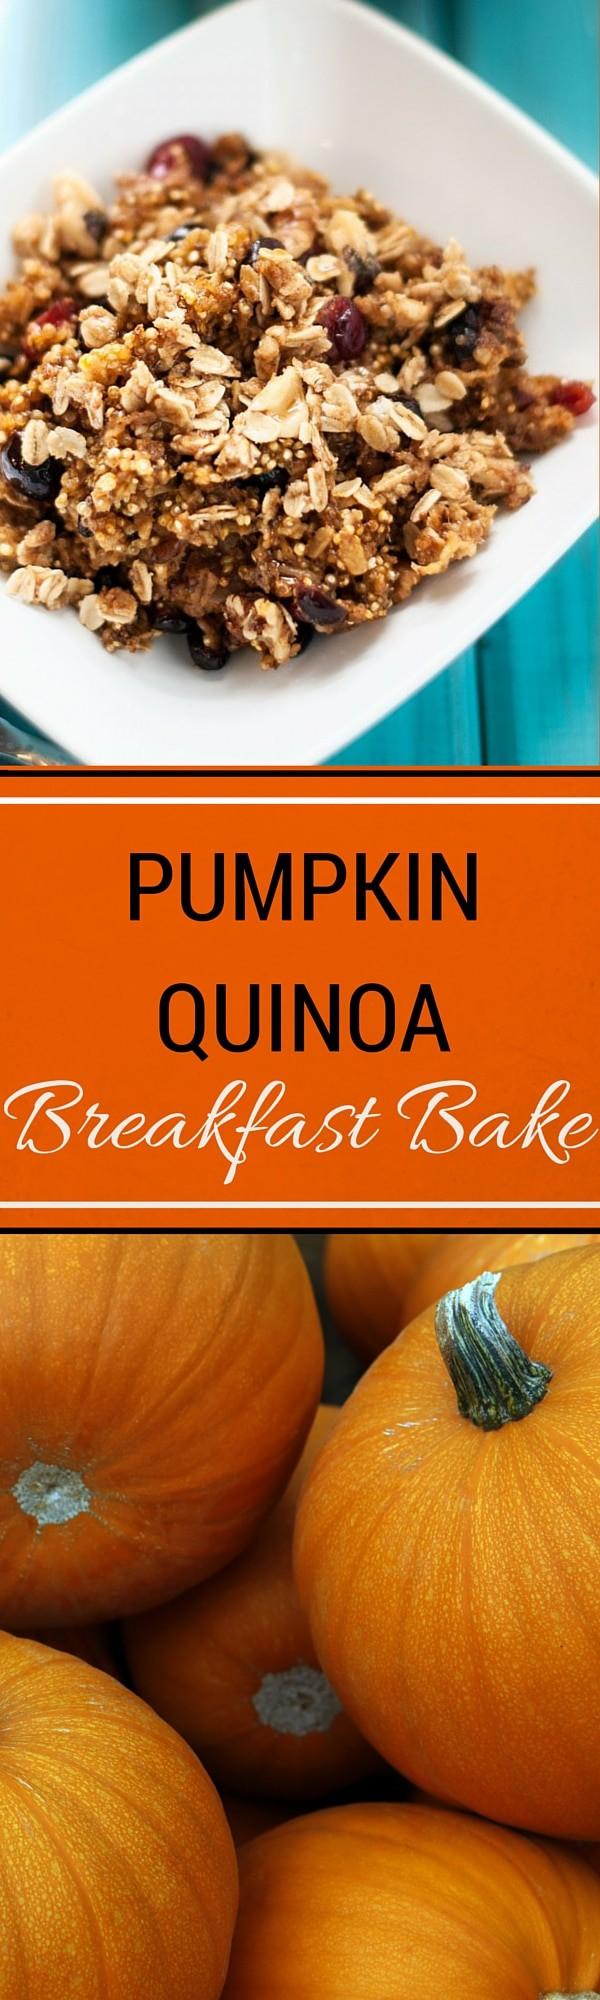 Pumpkin Quinoa Breakfast Bake